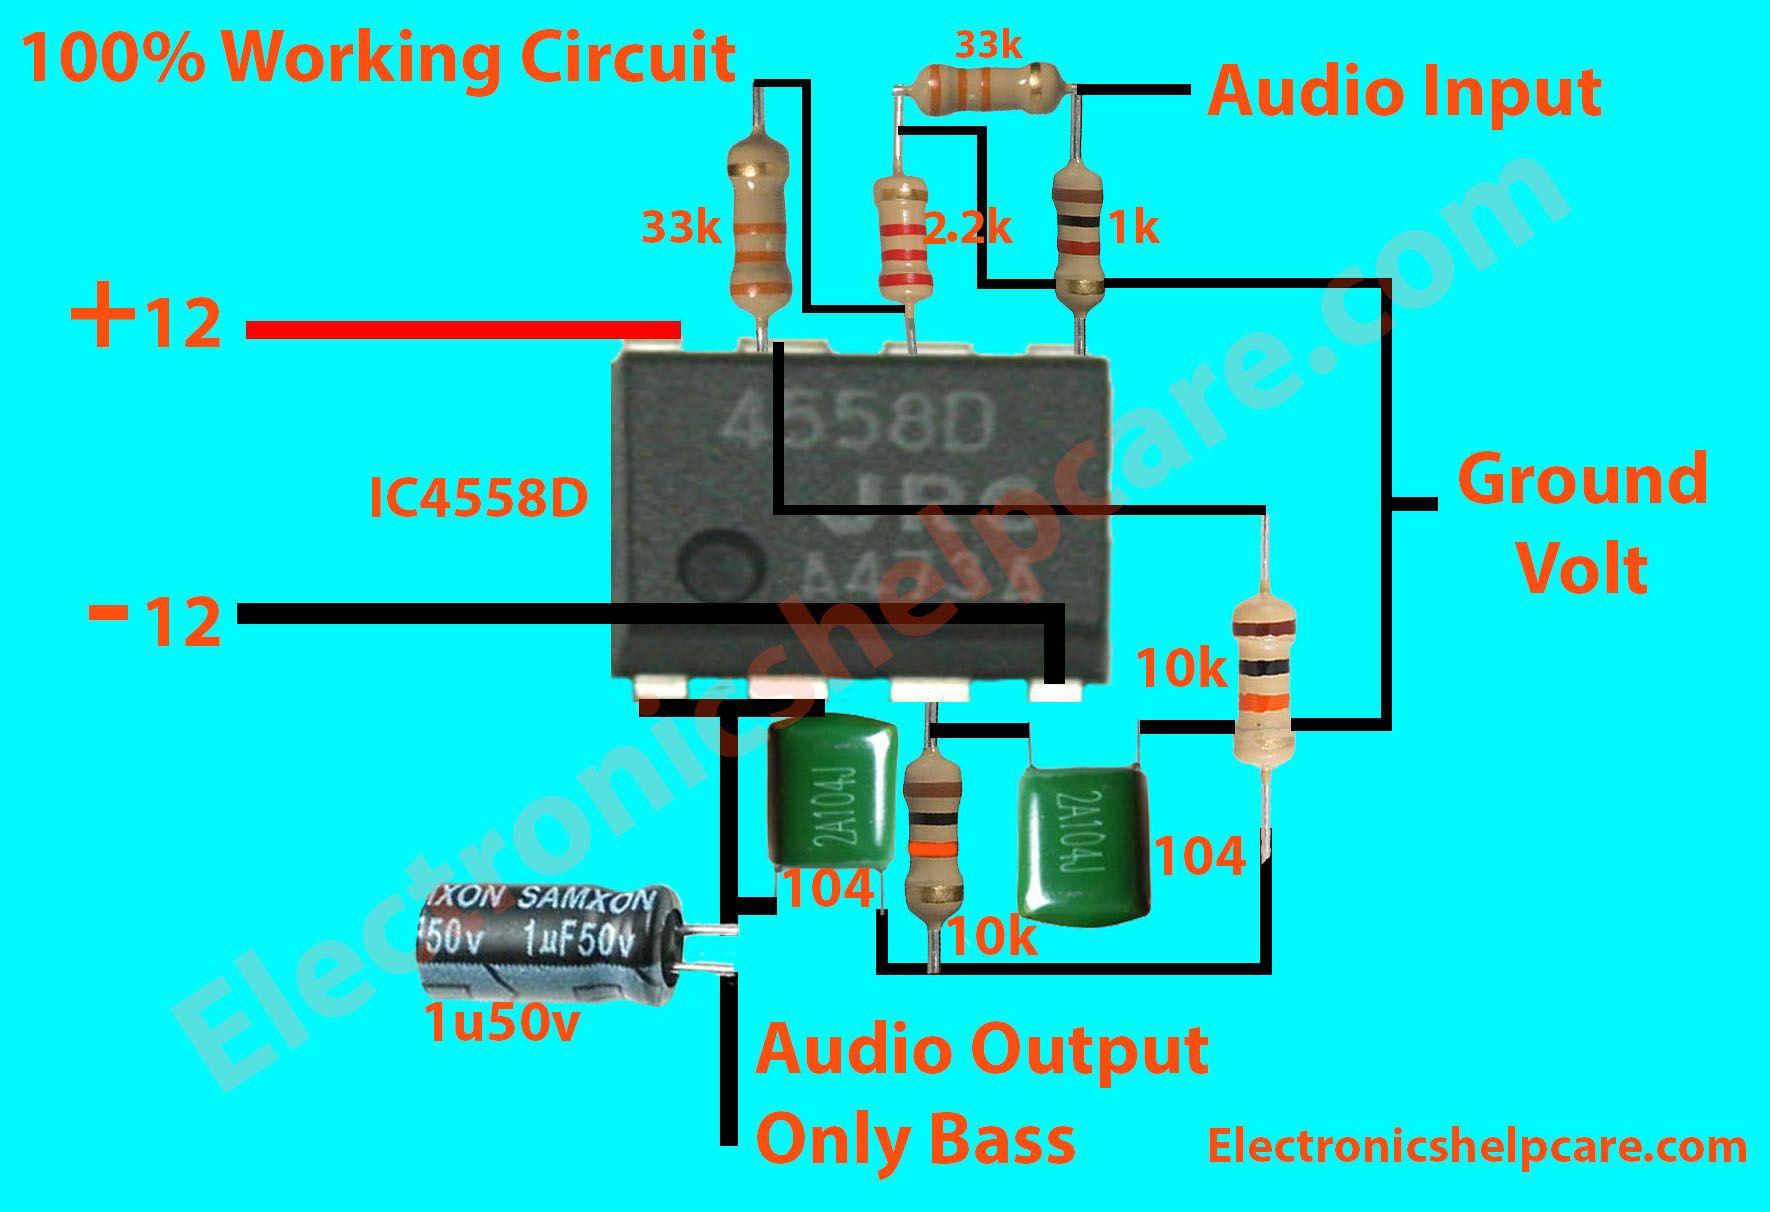 How To Make Bass Circuit Diagram Low Pass Filter Circuit Diagram 100 Working Electronics Electronic Circuit Projects Circuit Diagram Subwoofer Amplifier